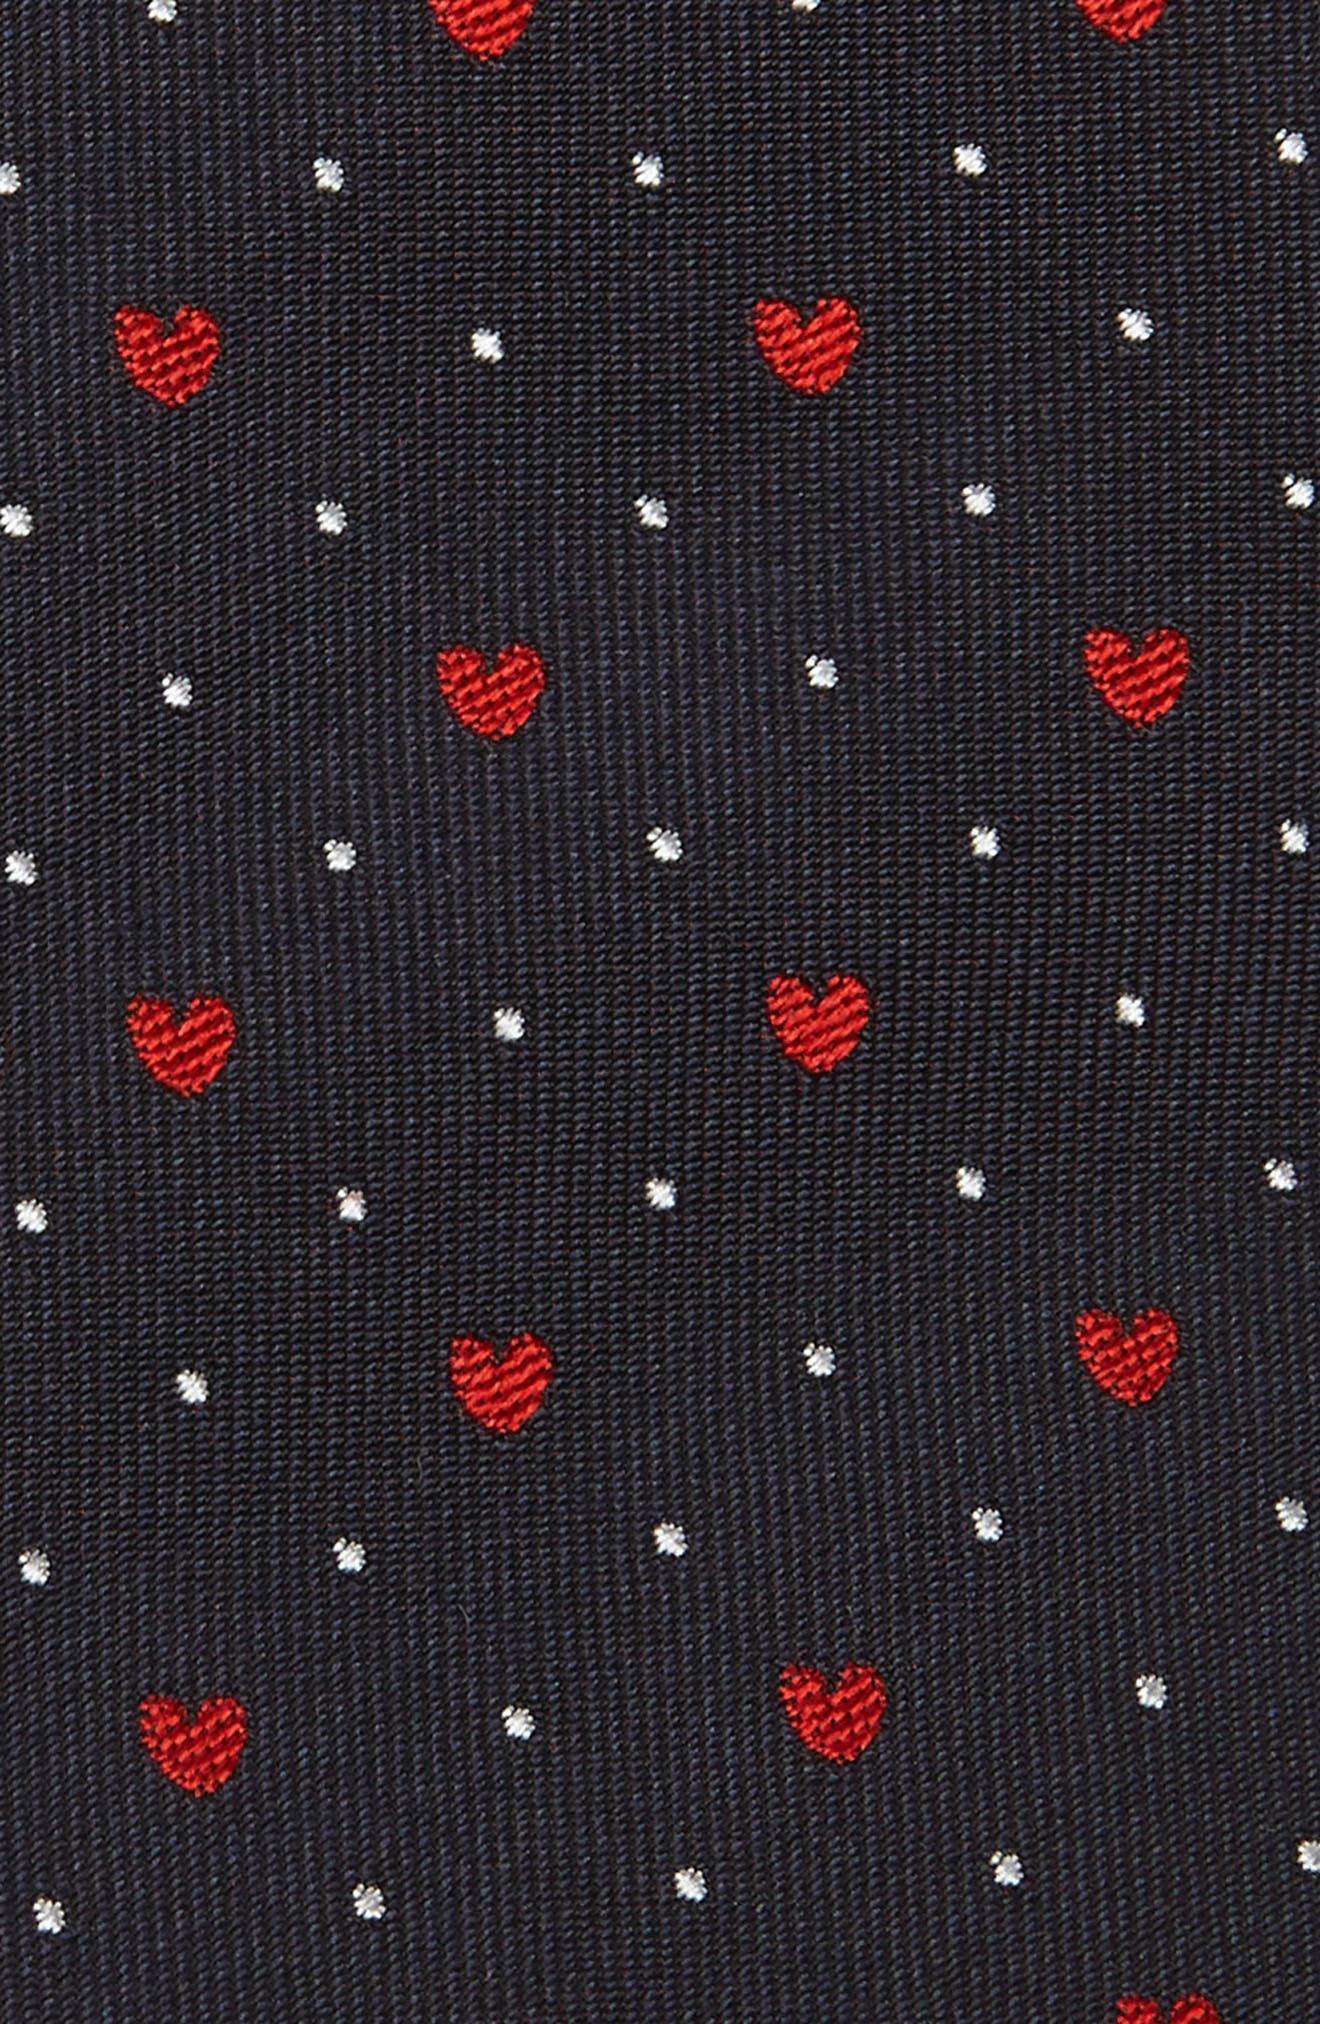 PAUL SMITH,                             Heart Silk Tie,                             Alternate thumbnail 2, color,                             NAVY